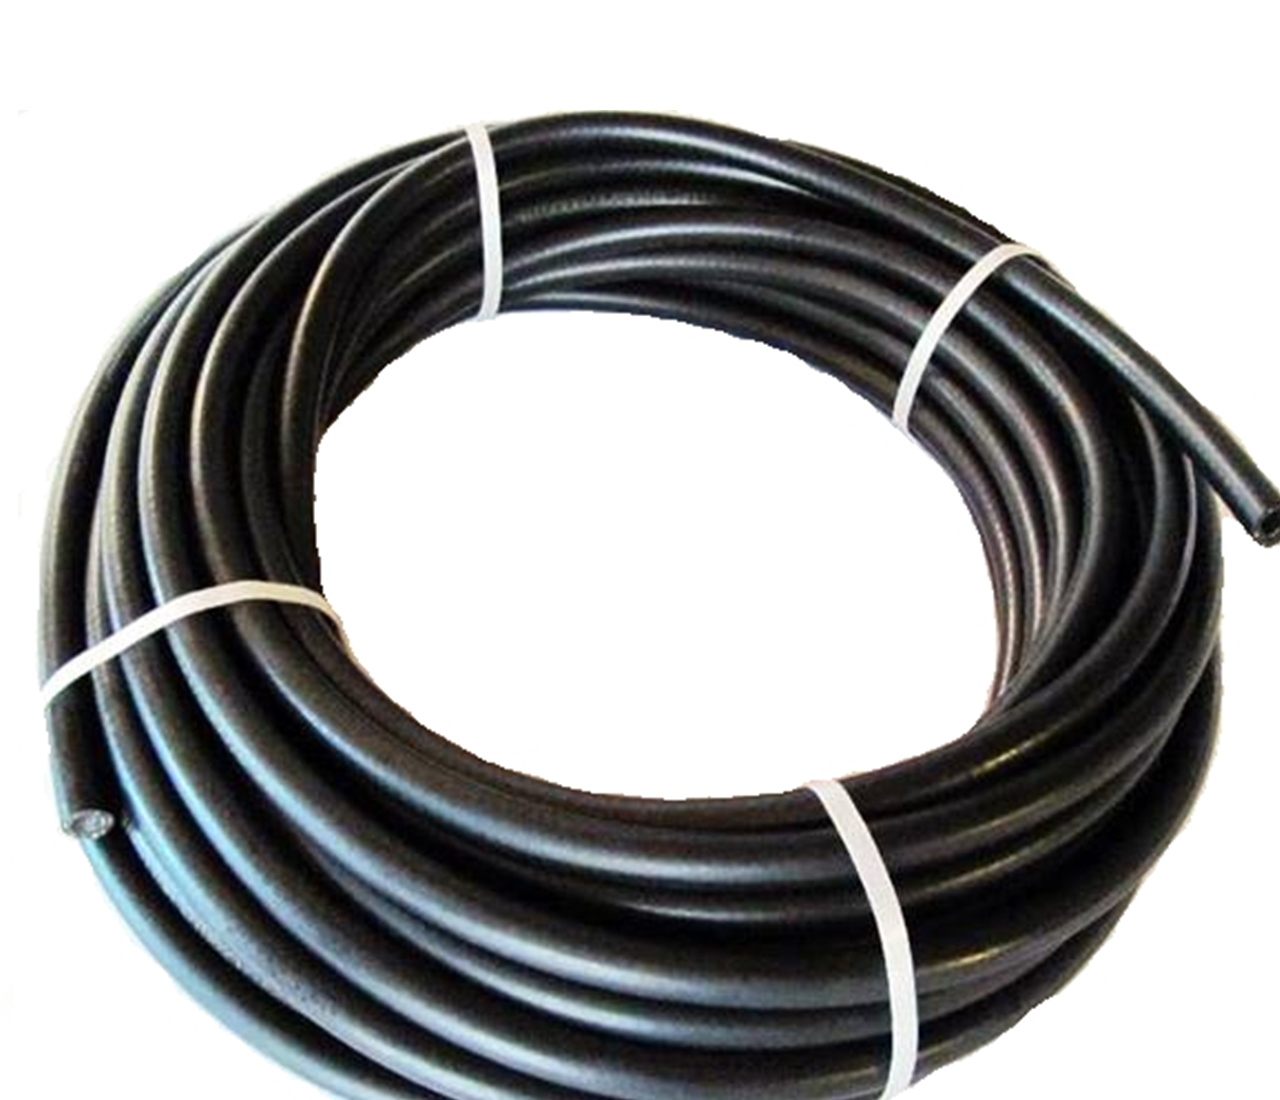 кабель газовый шланг снг semperit fi12 12mm Цска